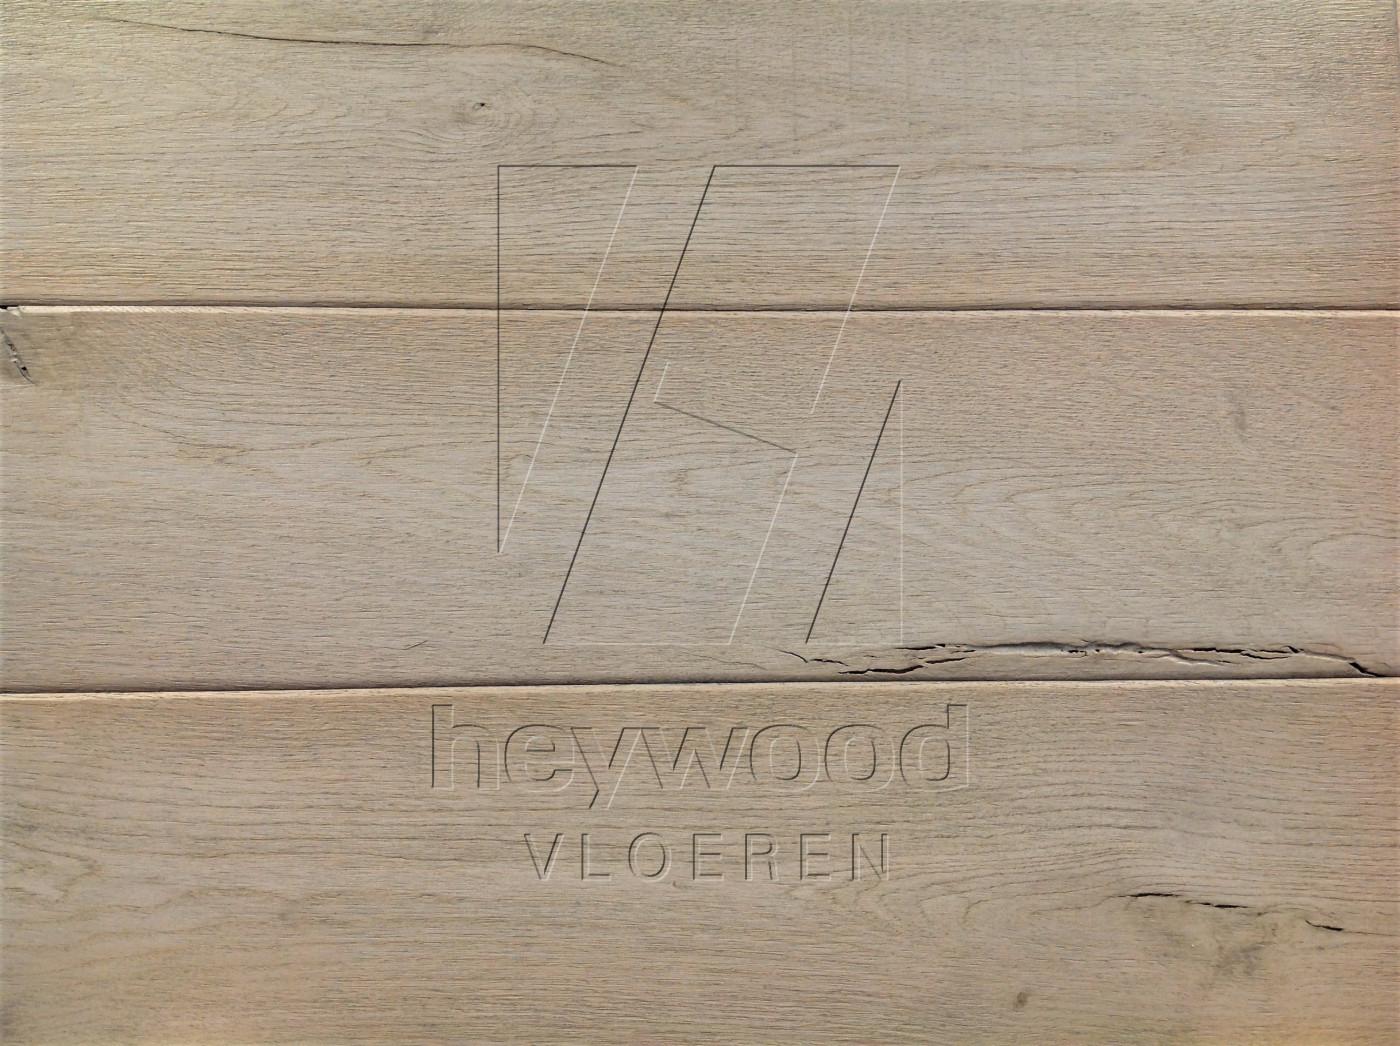 Shrunk Plank 'Lyngmark' in Aged Shrunk surface of Aged Hardwood Floors